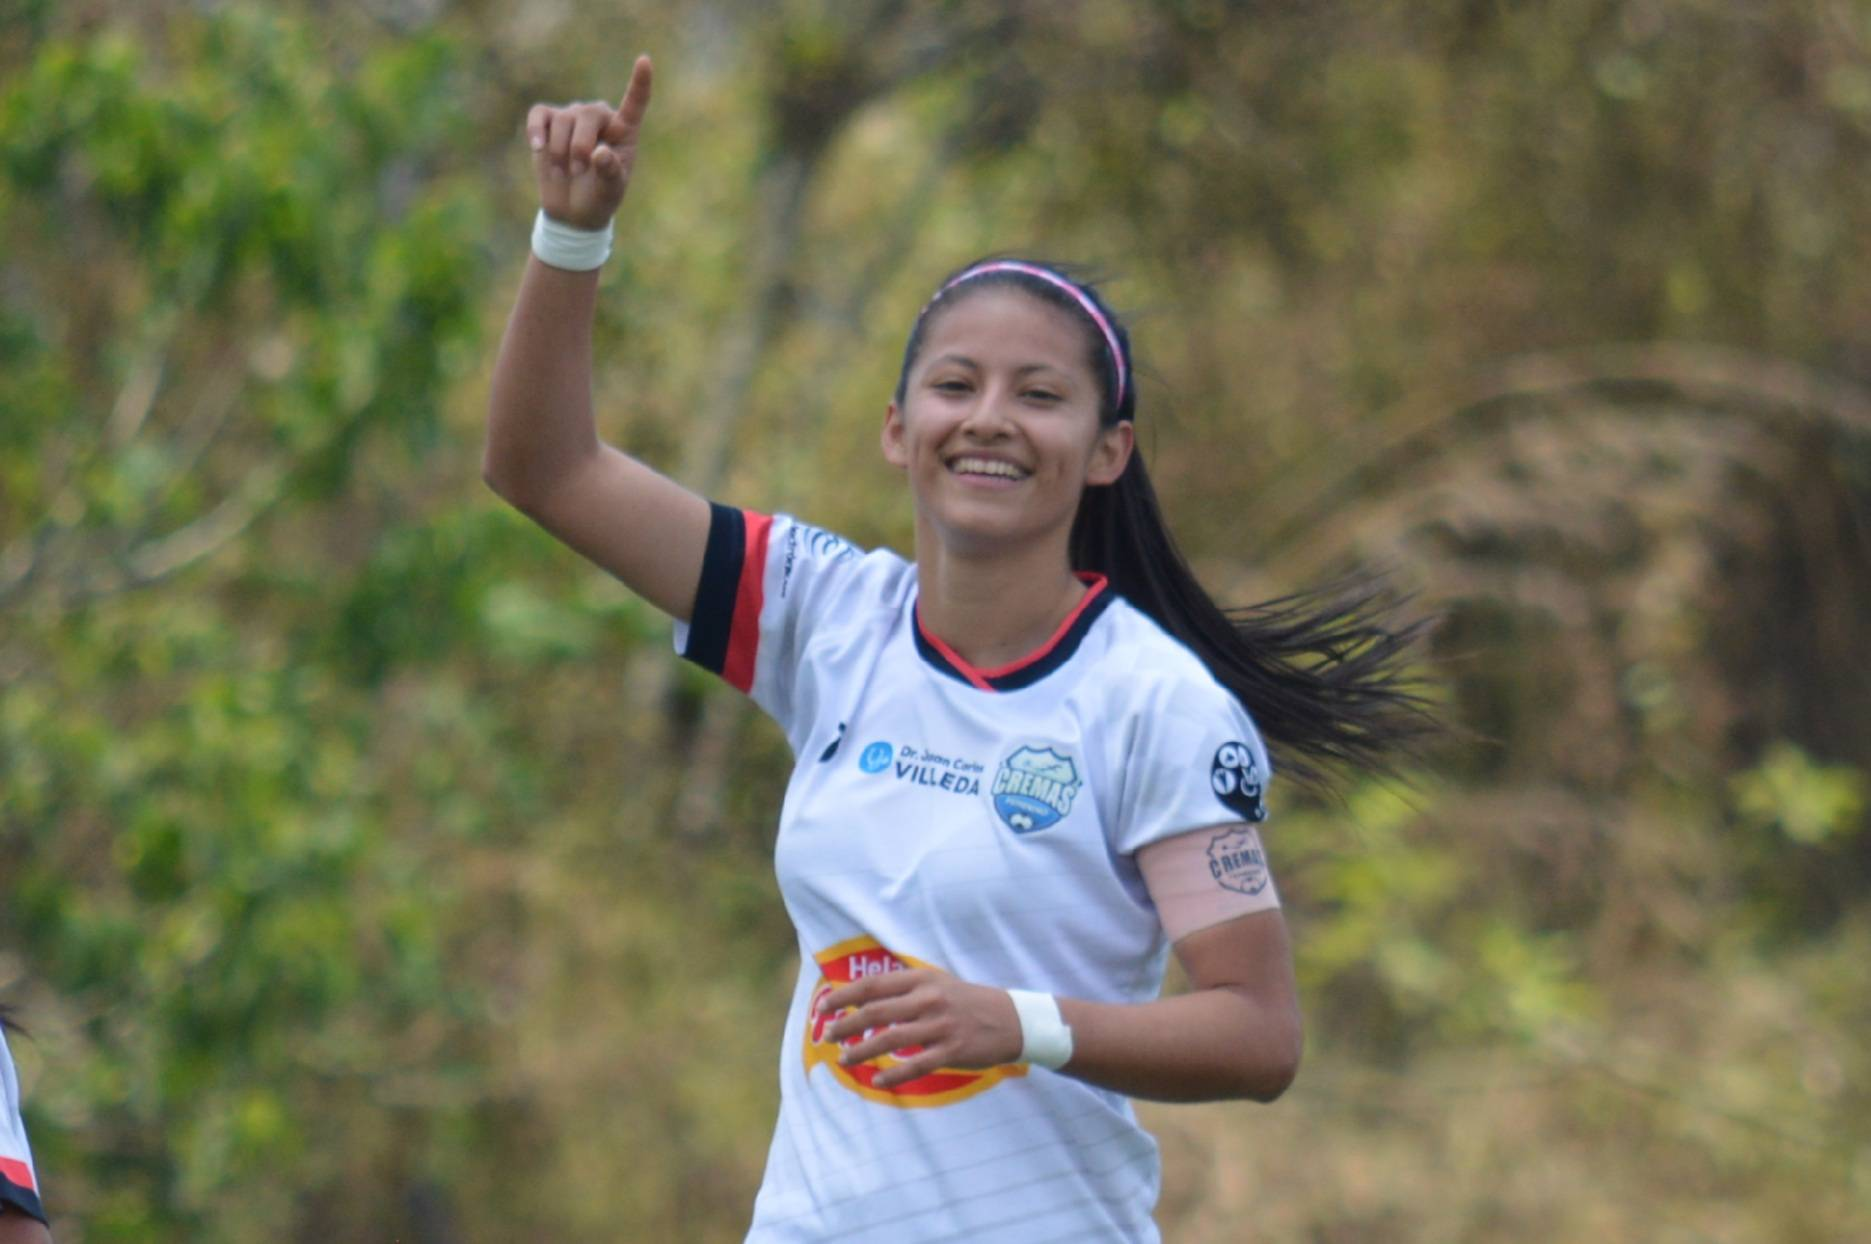 De Mixco a Zaragoza, el reto del fútbol europeo para Andrea Álvarez imagen